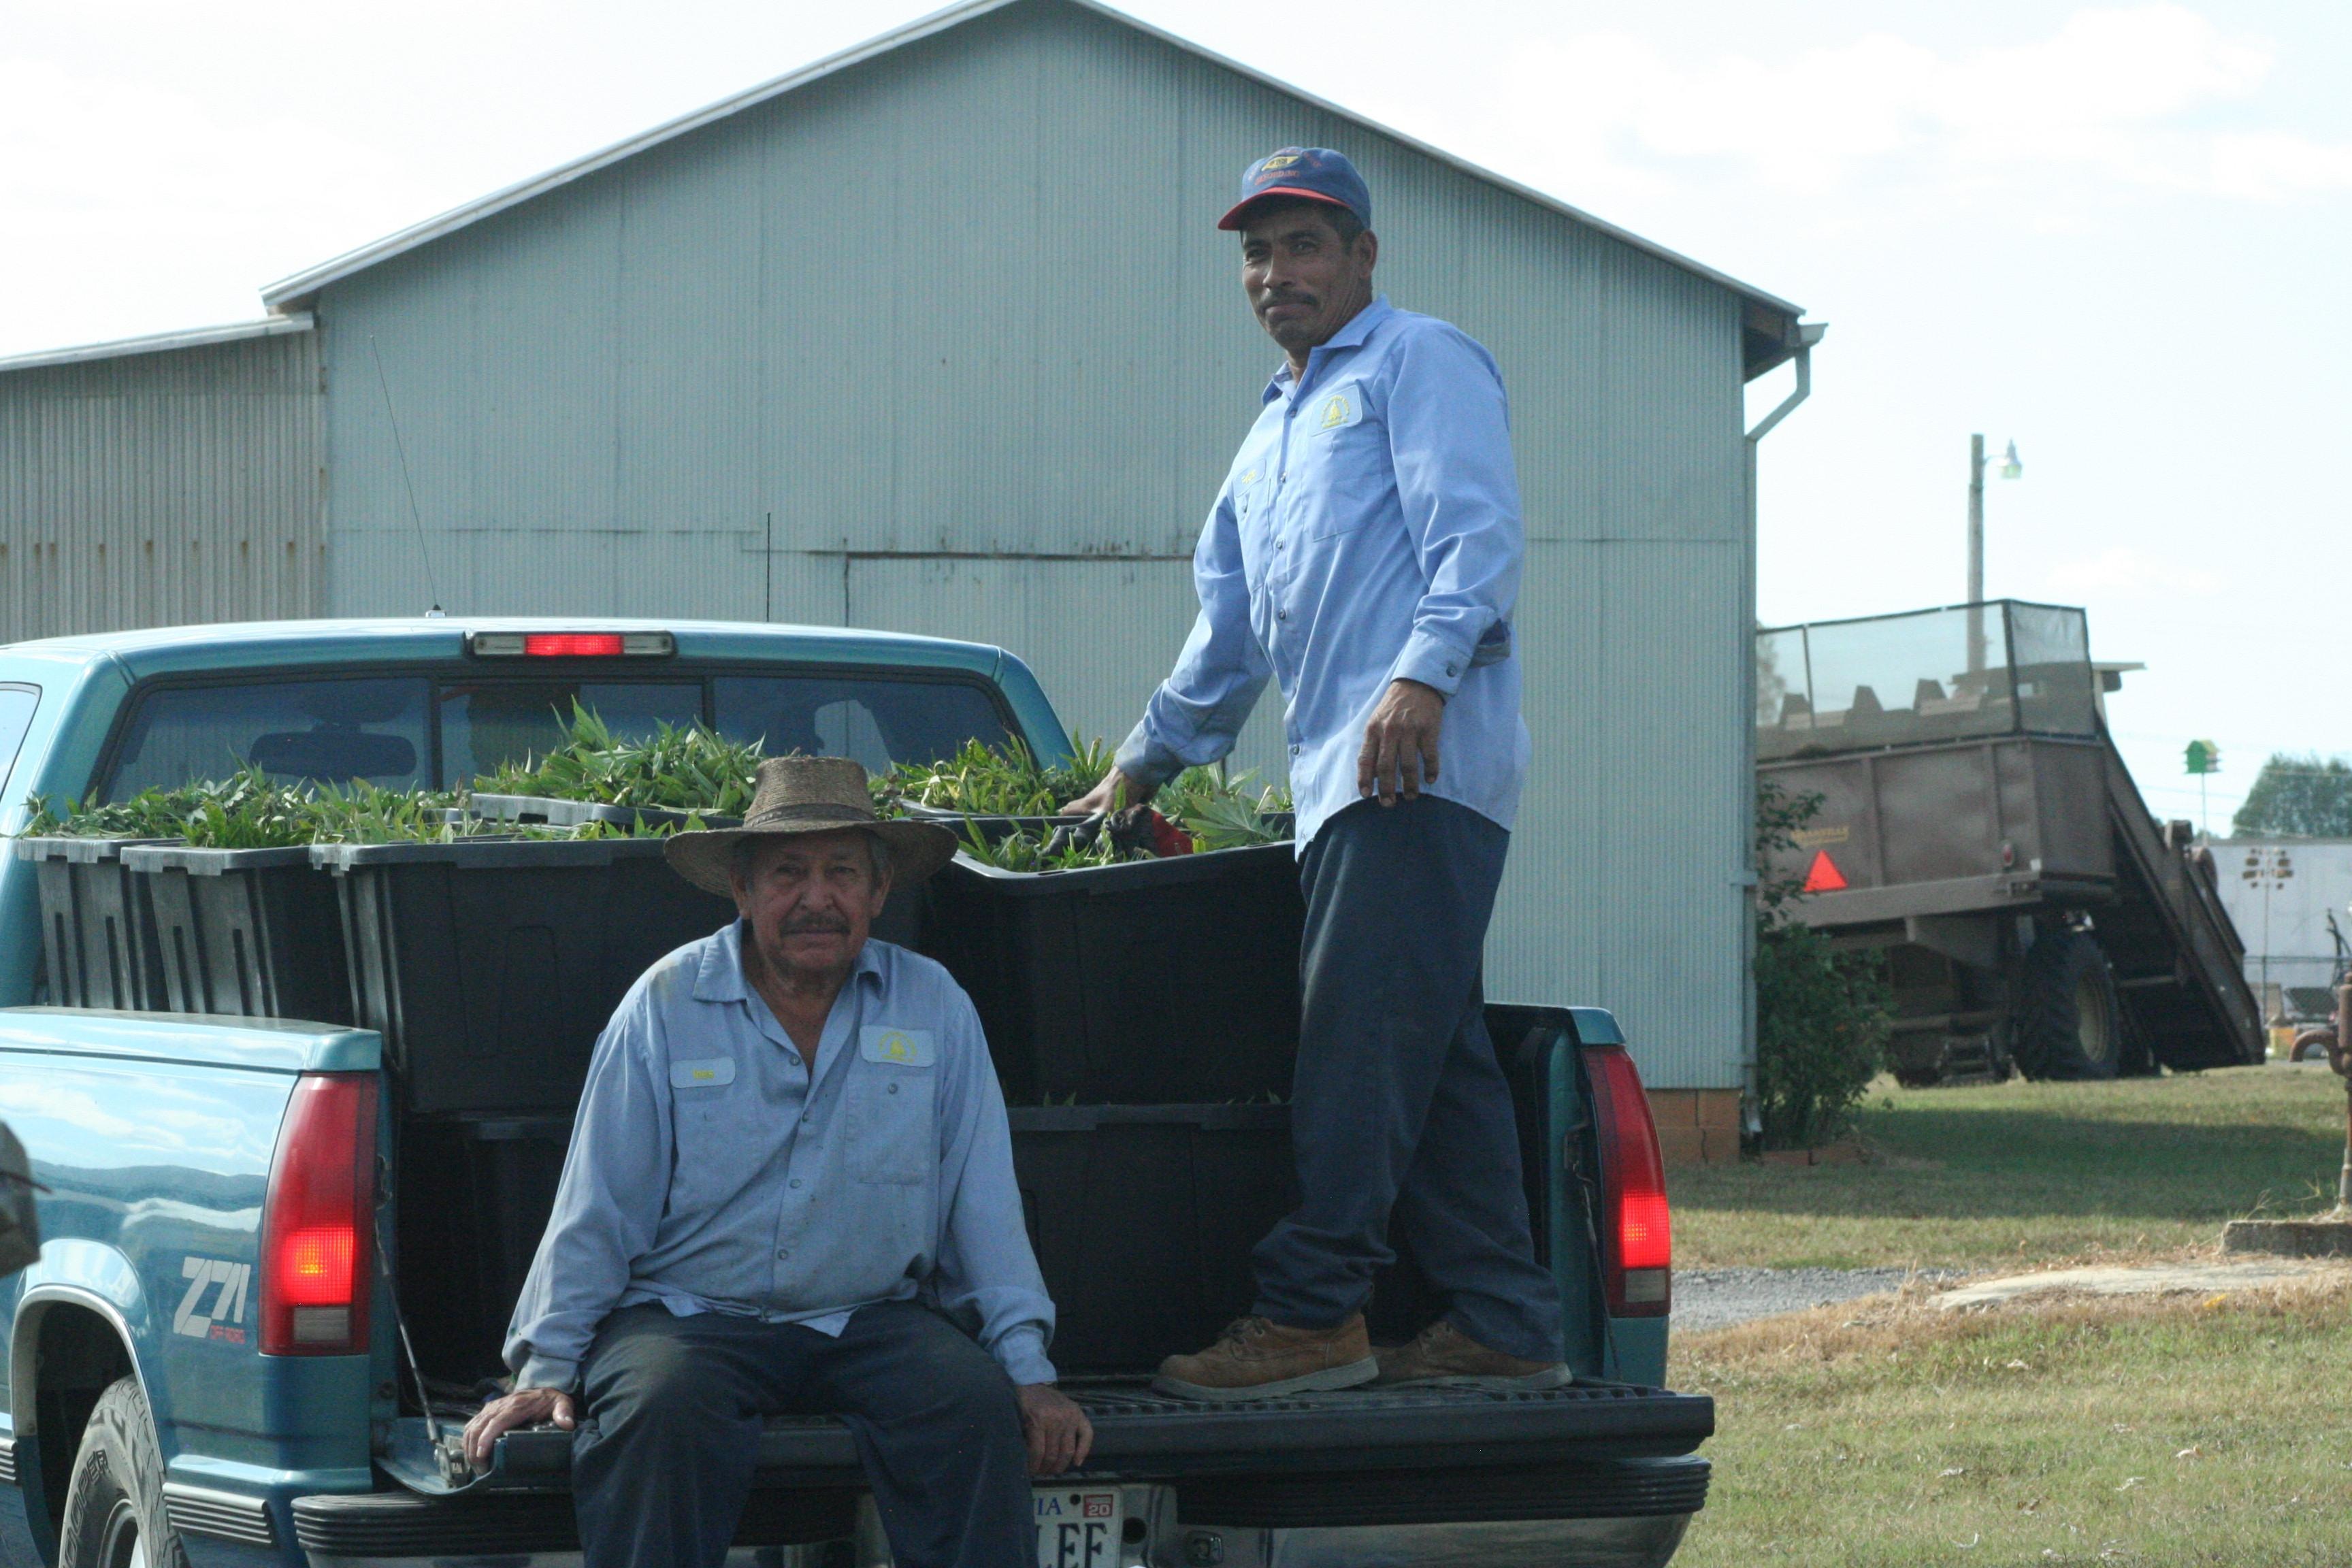 Local farmers suggest hemp is business gamble - Progress Index